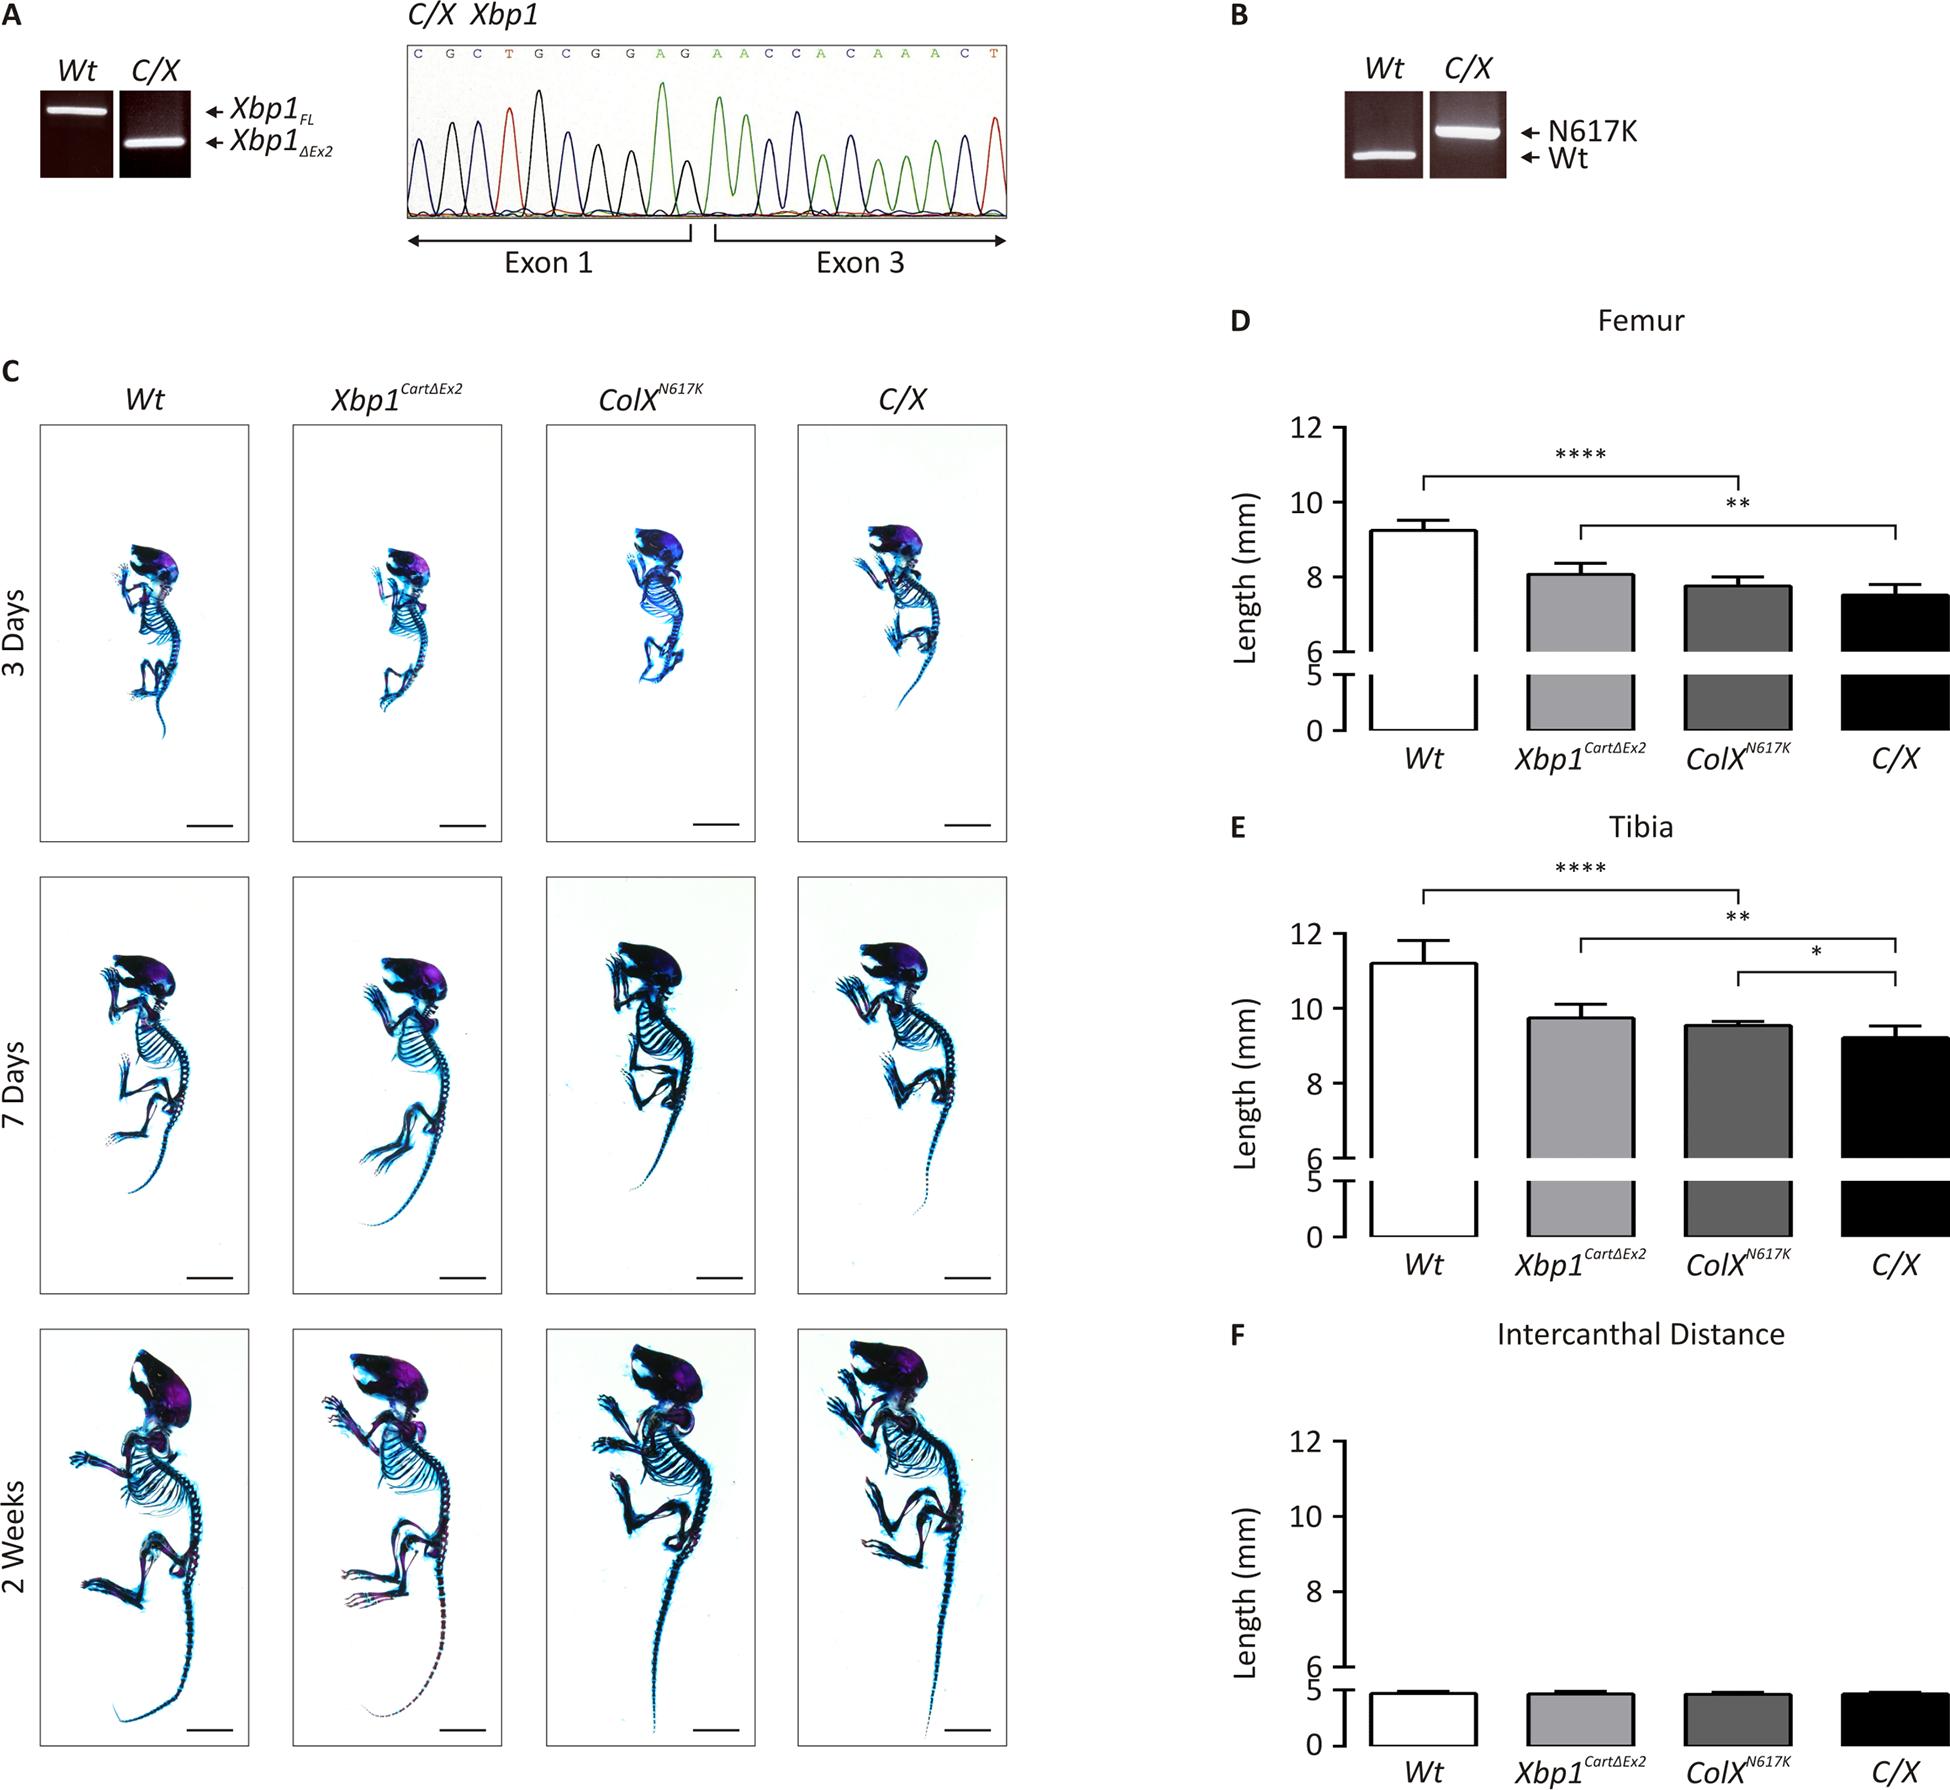 Genetic and morphometric characterization of <i>C/X</i> mice.